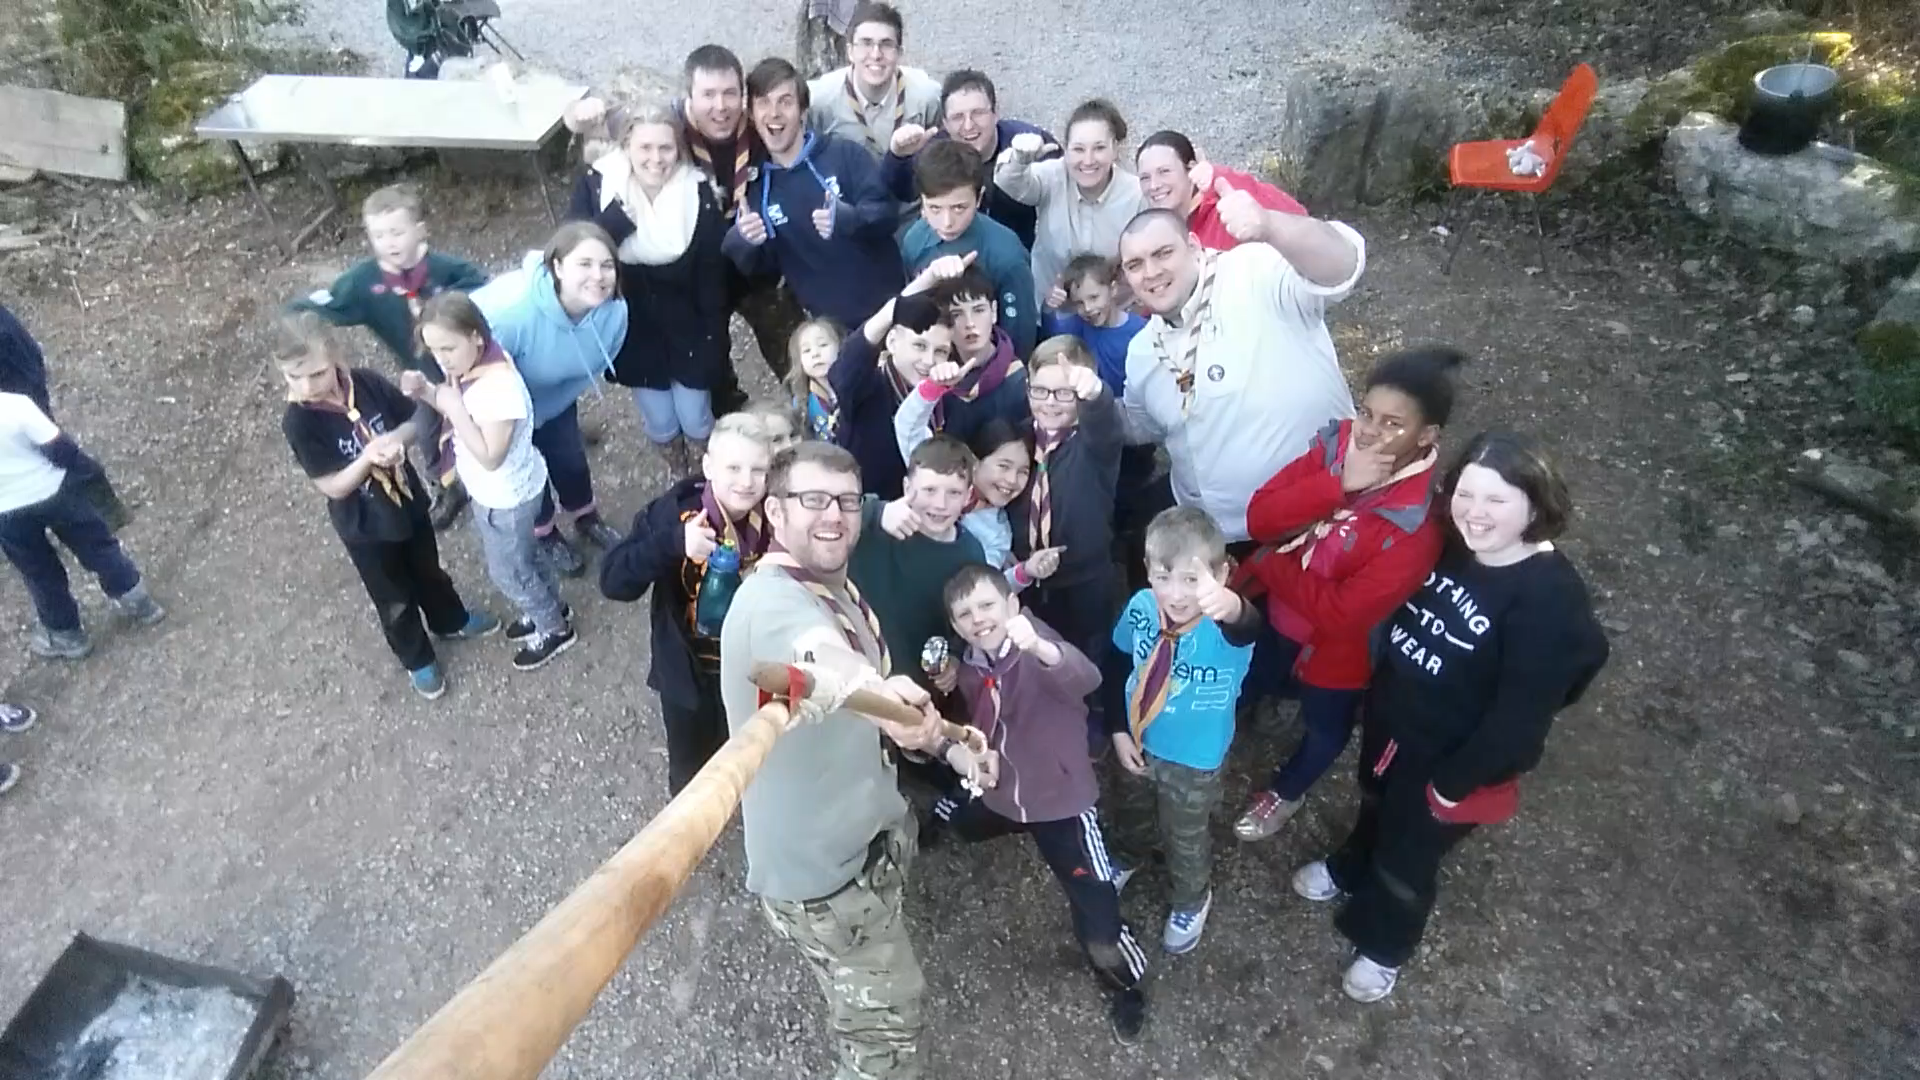 Scout selfie stick